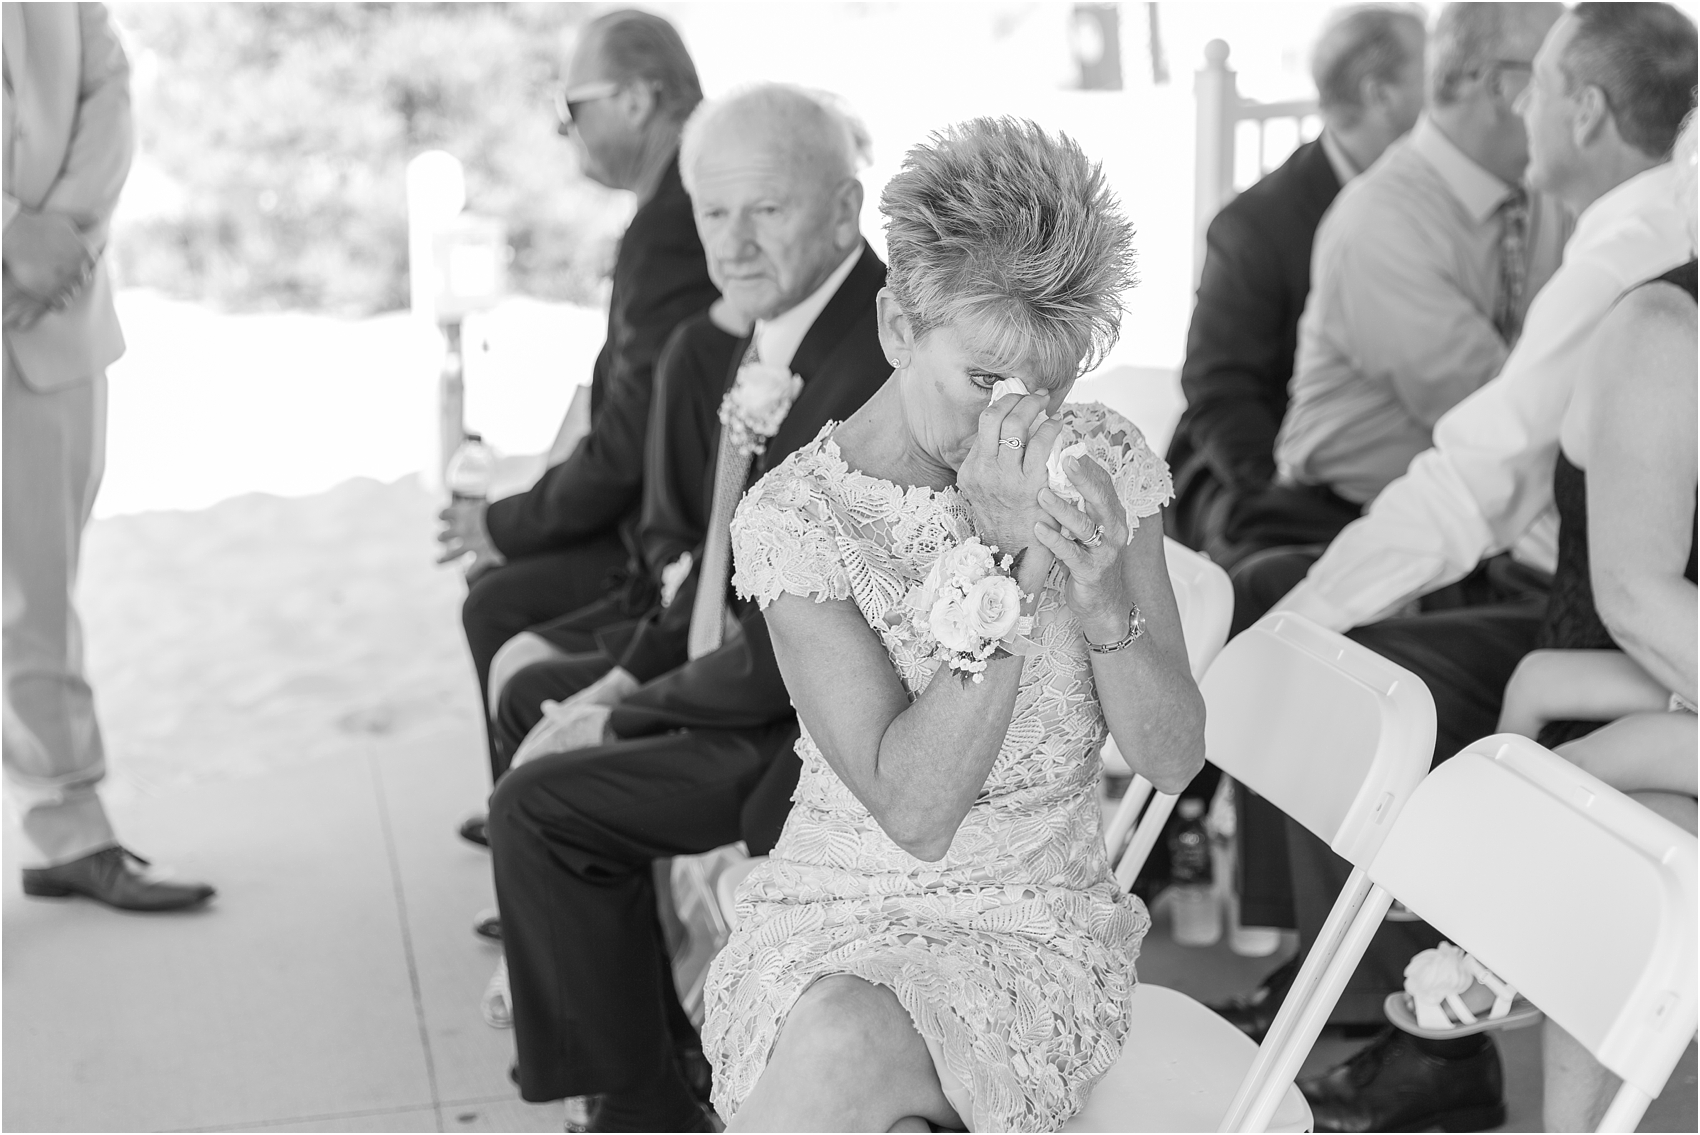 fun-whimsical-beach-wedding-photos-in-st-joseph-michigan-by-courtney-carolyn-photography_0060.jpg